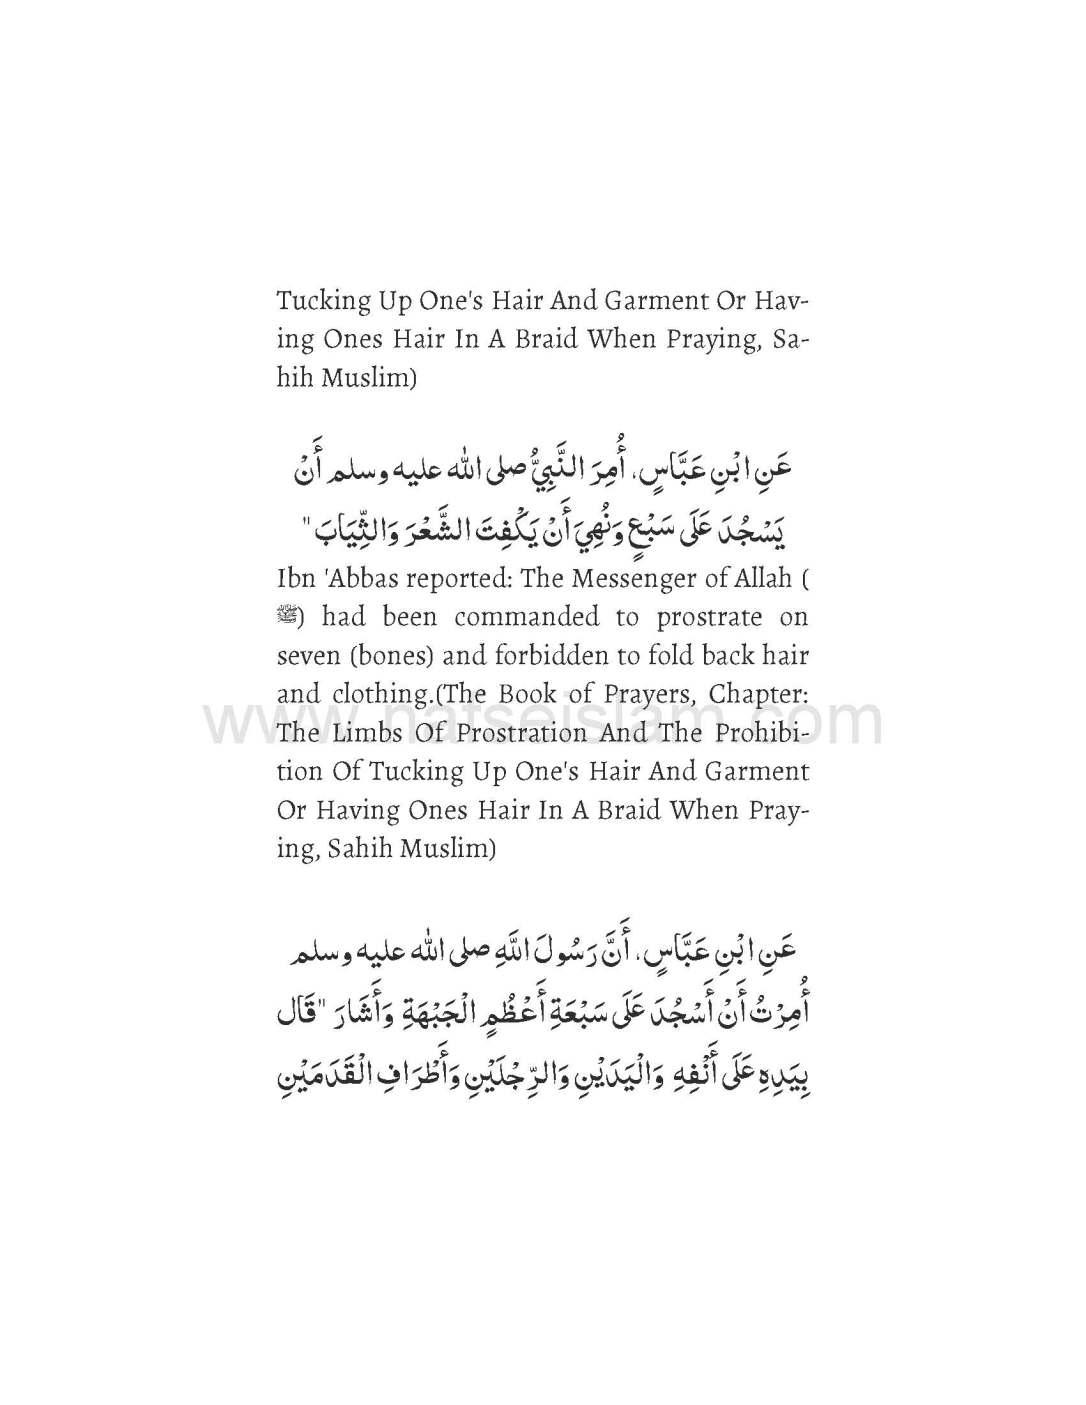 Islamic Ruling On Folding Pants In Salah_Page_12